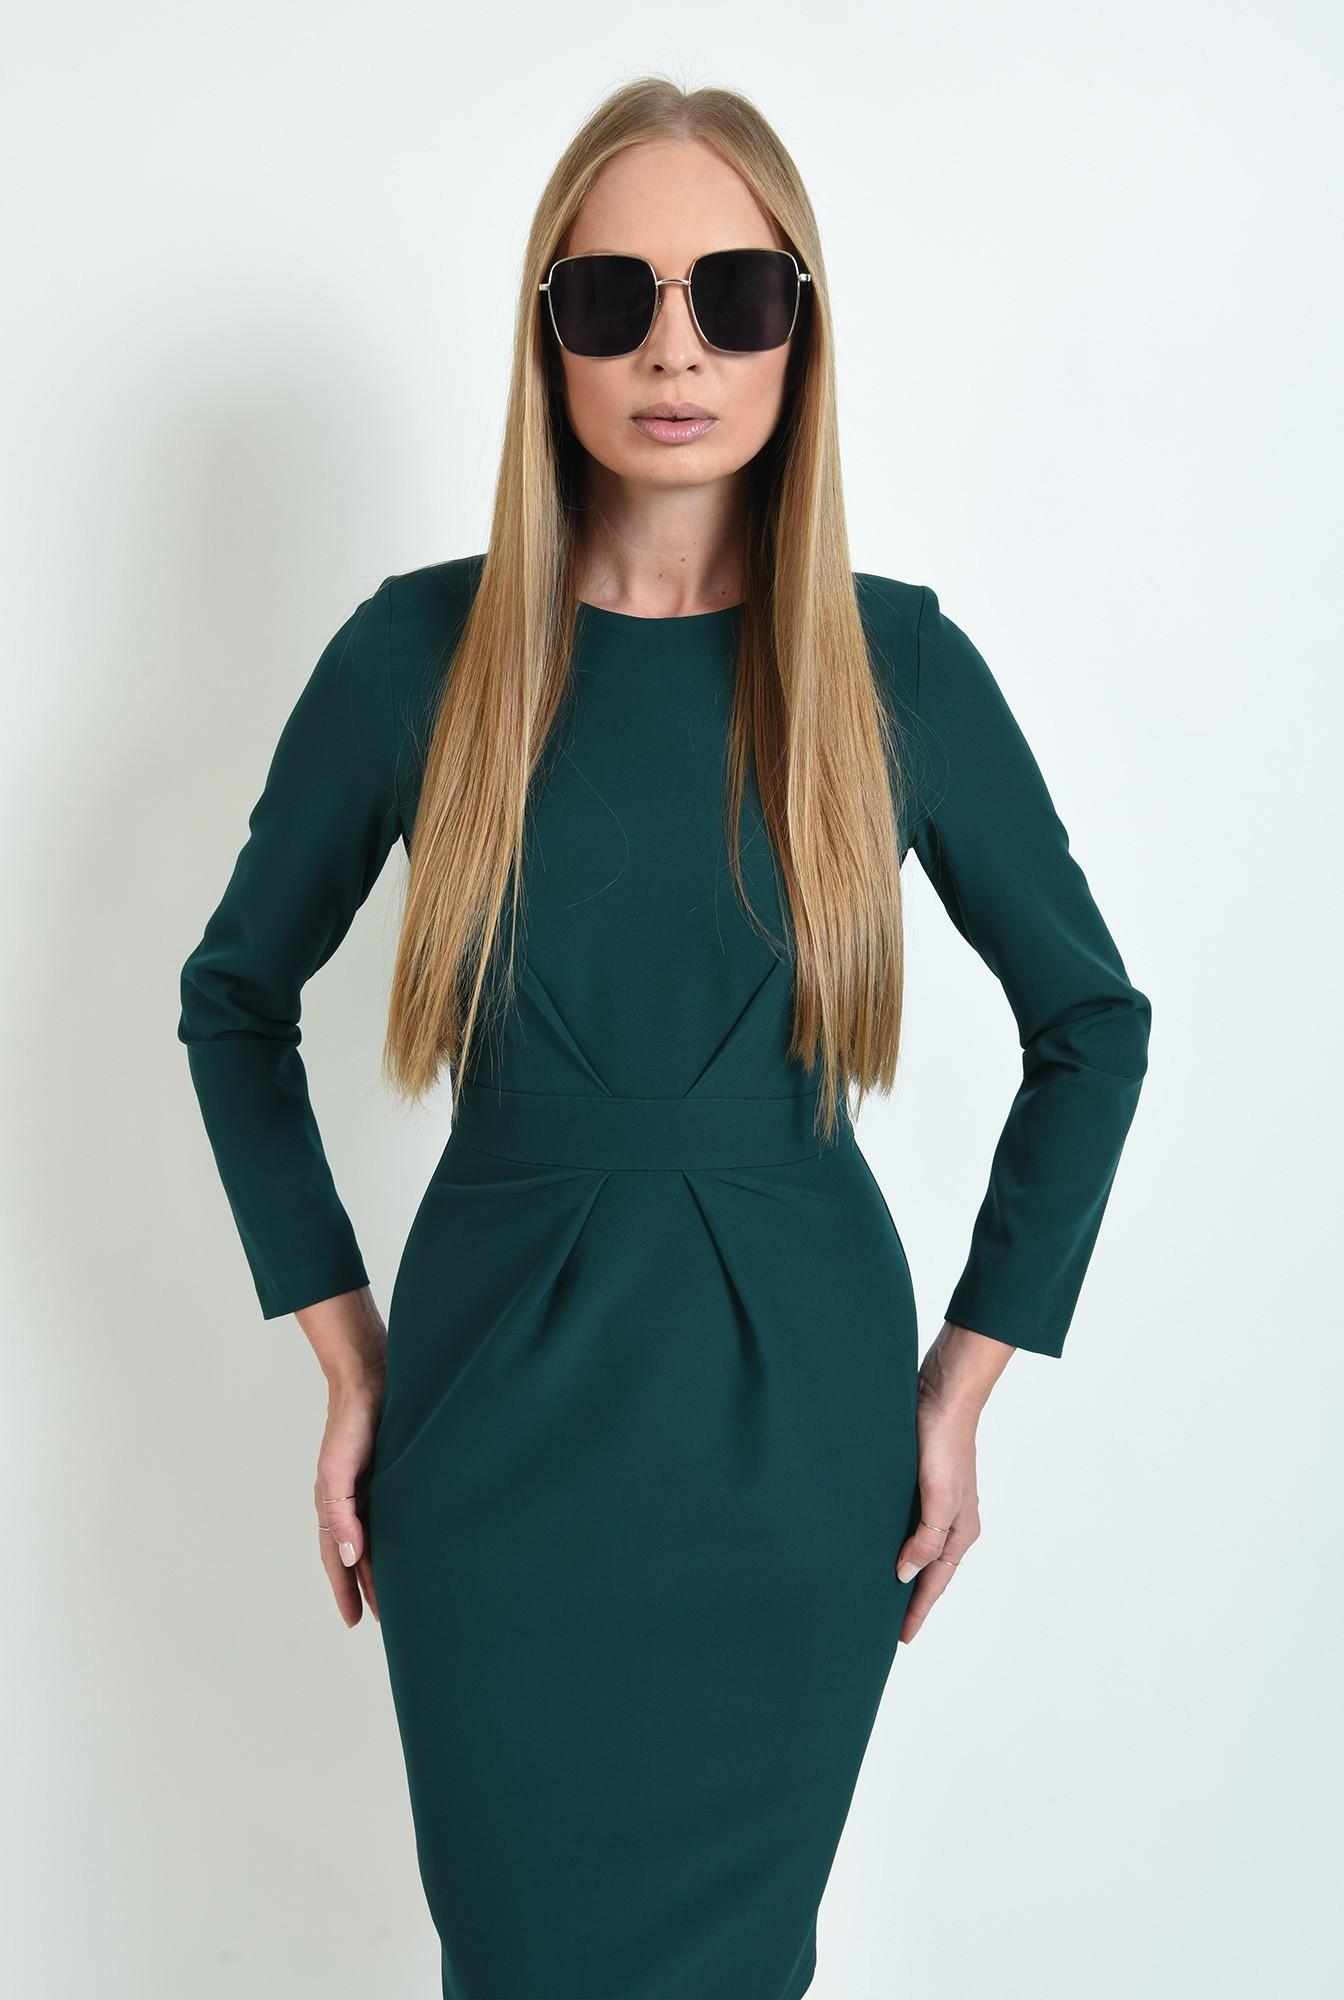 1 - rochie verde, office, cu pliuri, Poema